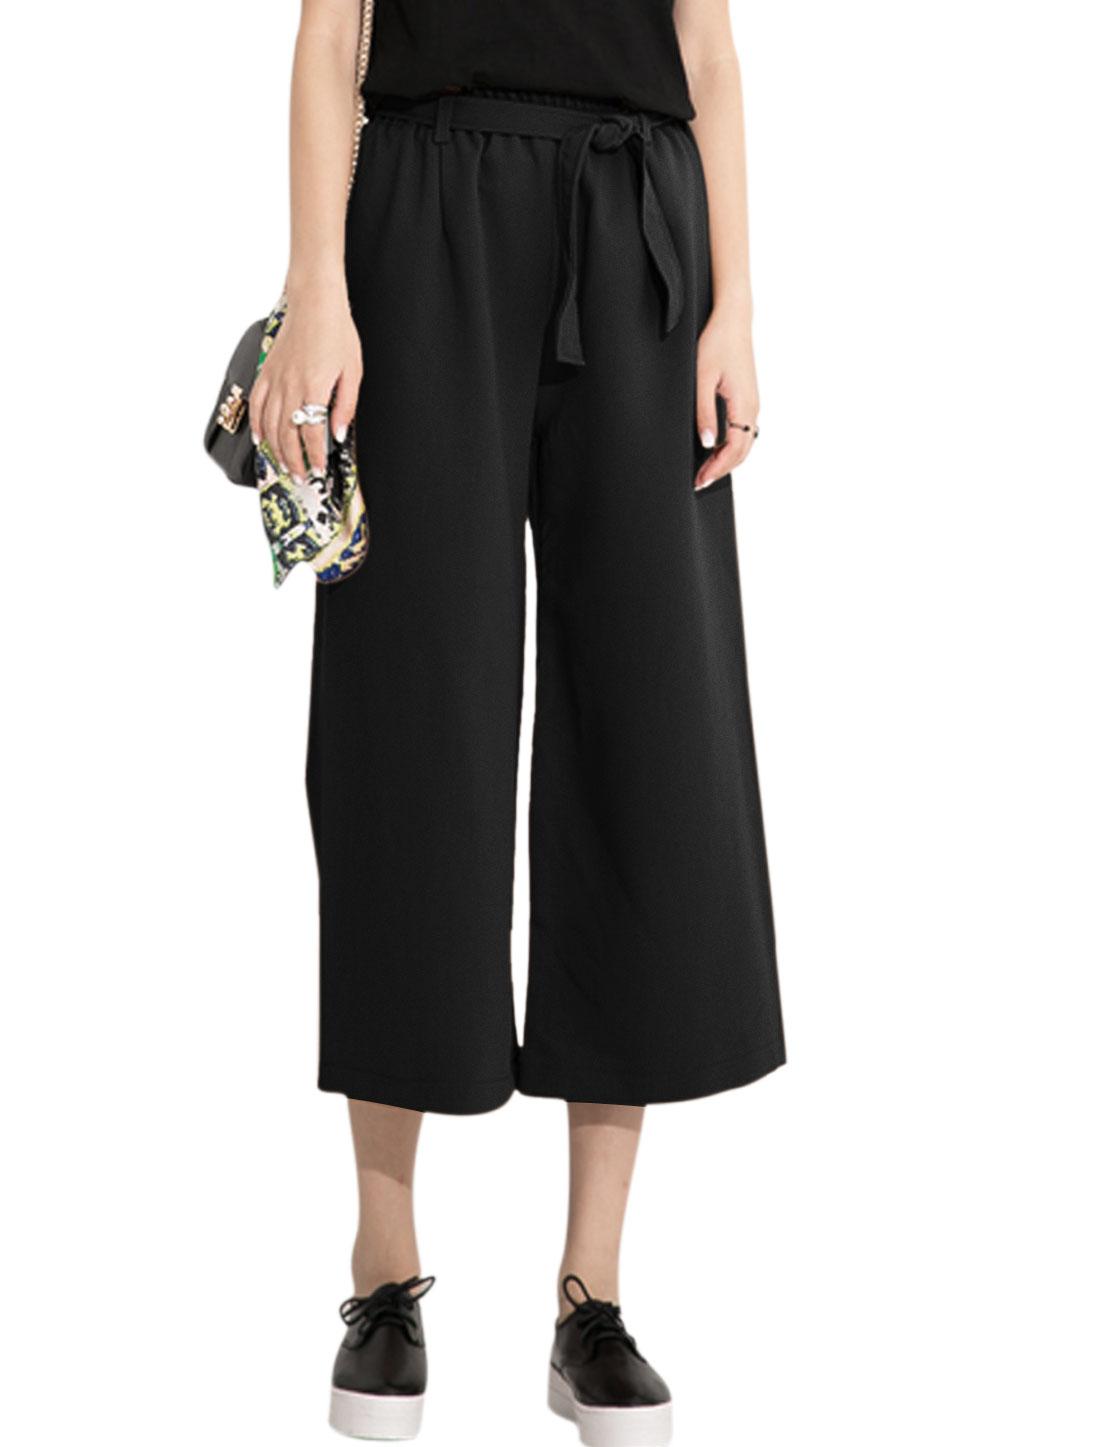 Ladies Elastic Waist Two Pockets Front Wide Leg Pants Black XS